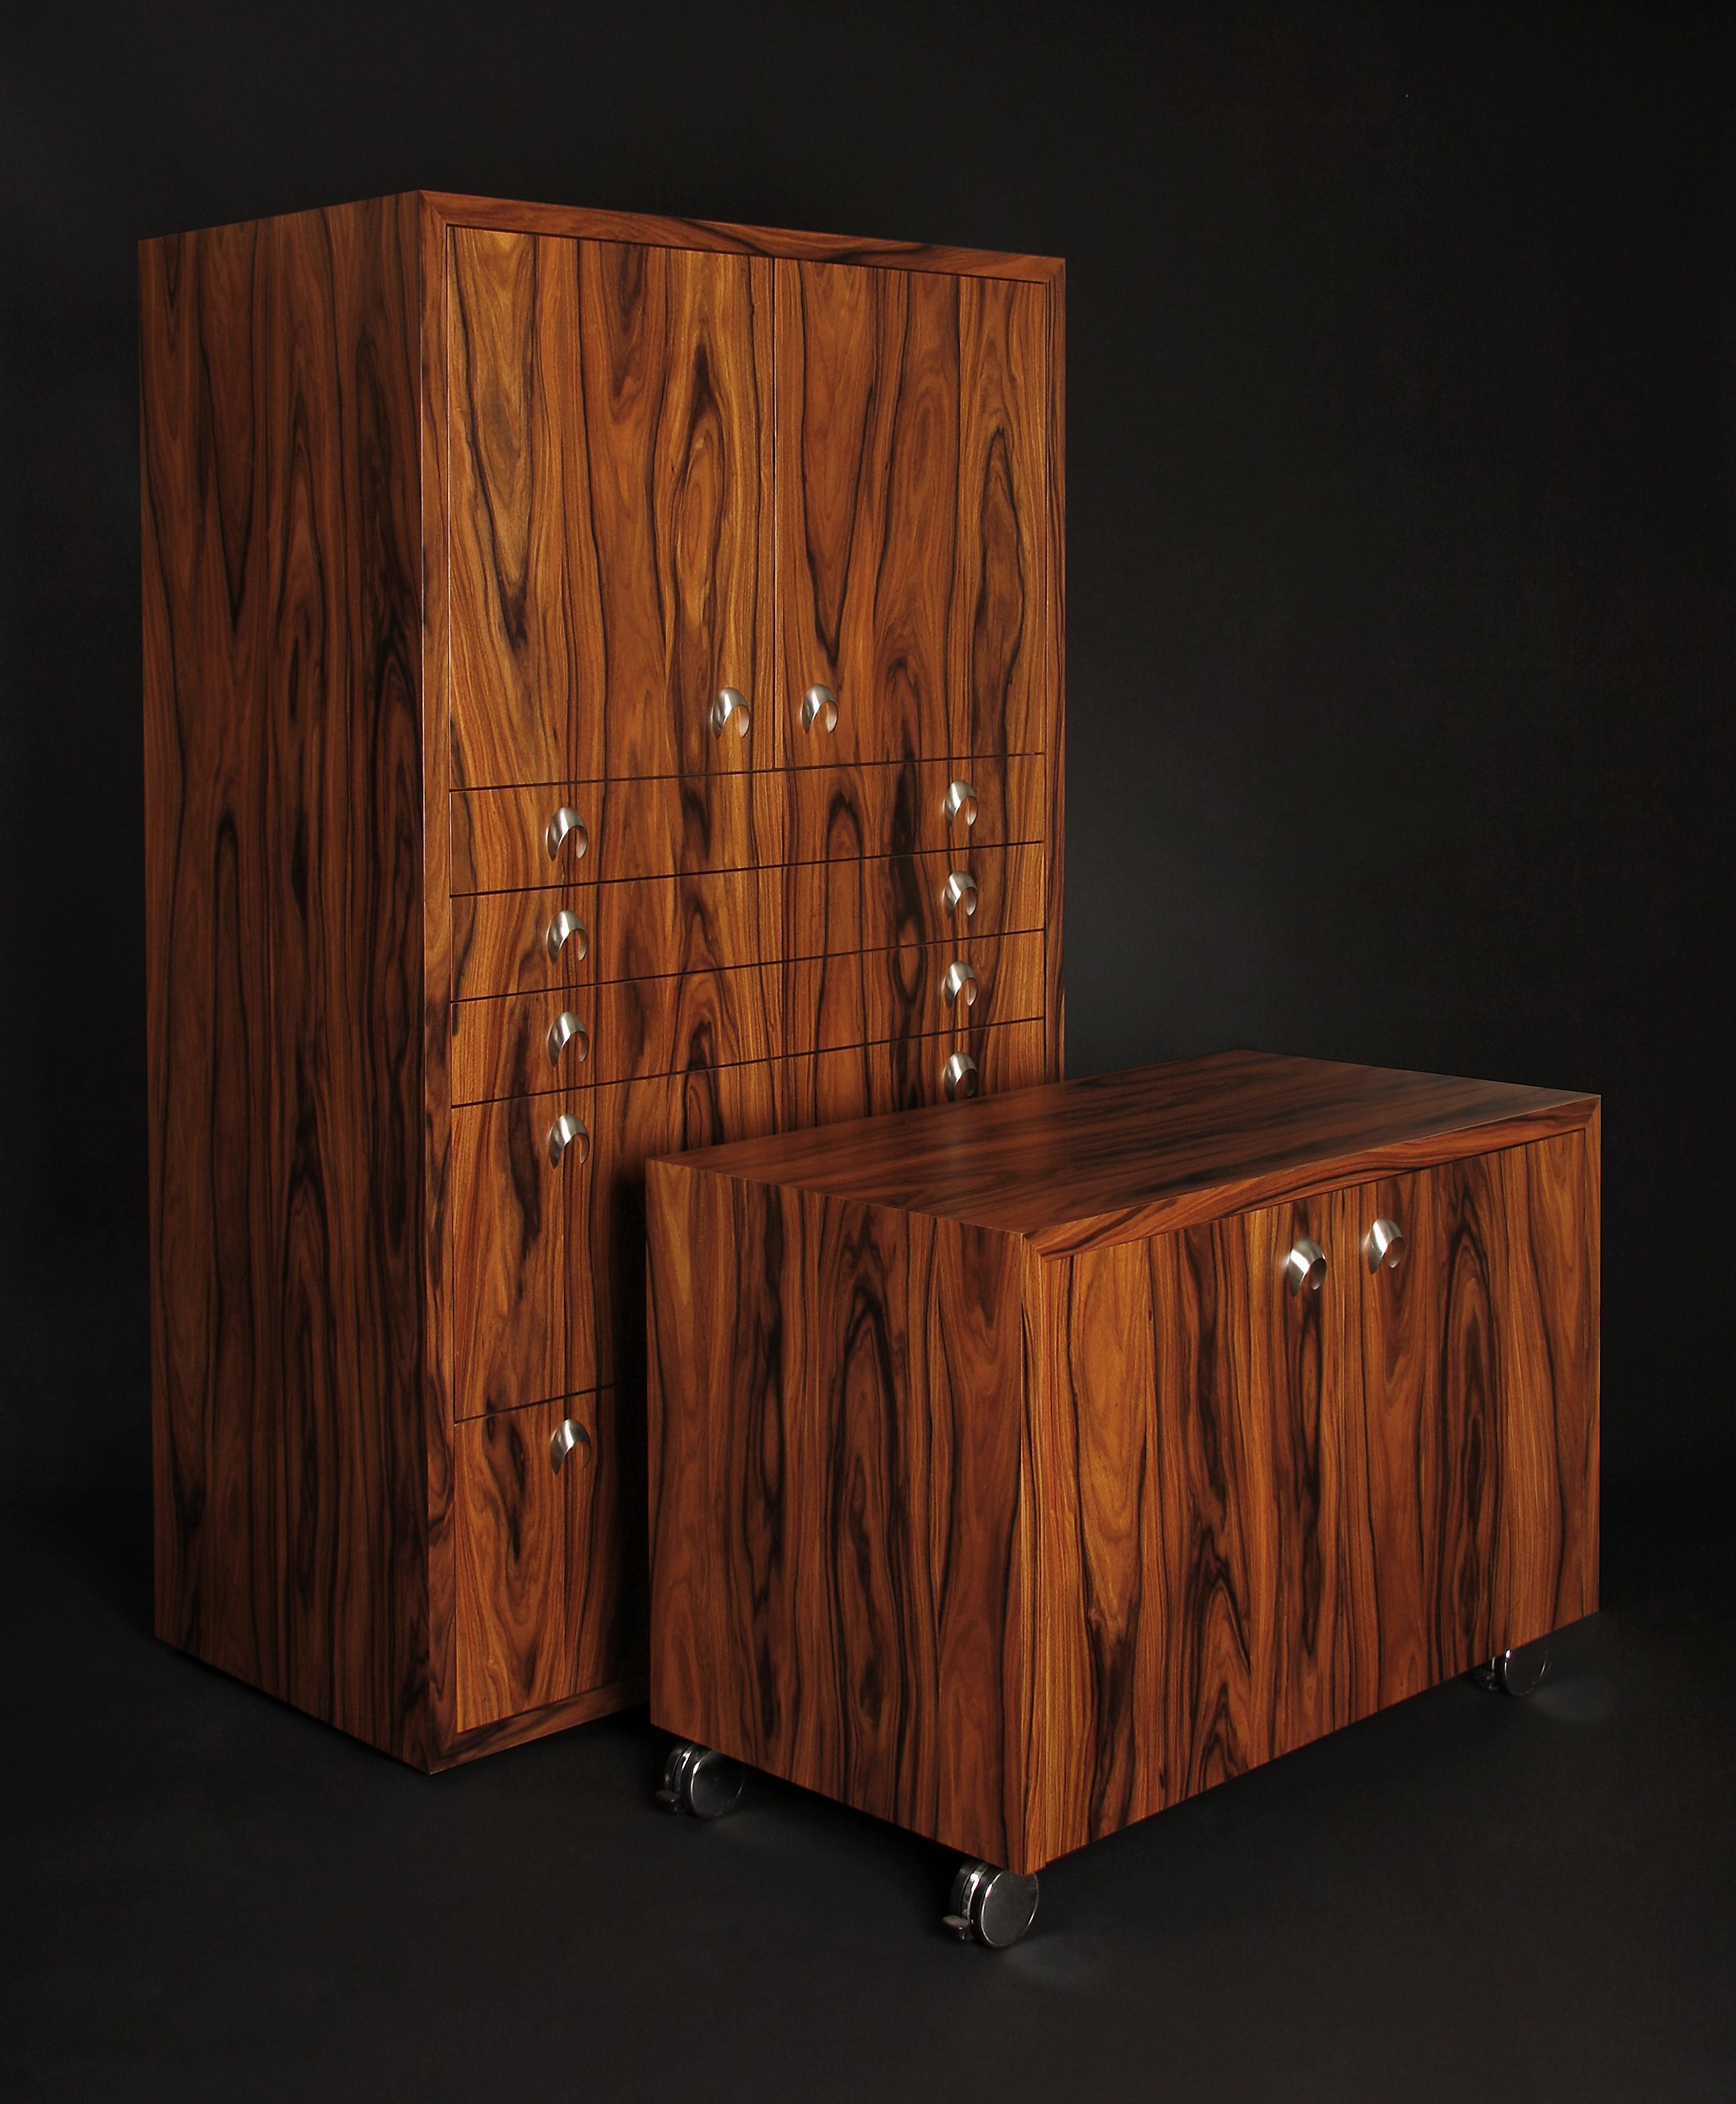 Pau Ferro File Cabinets